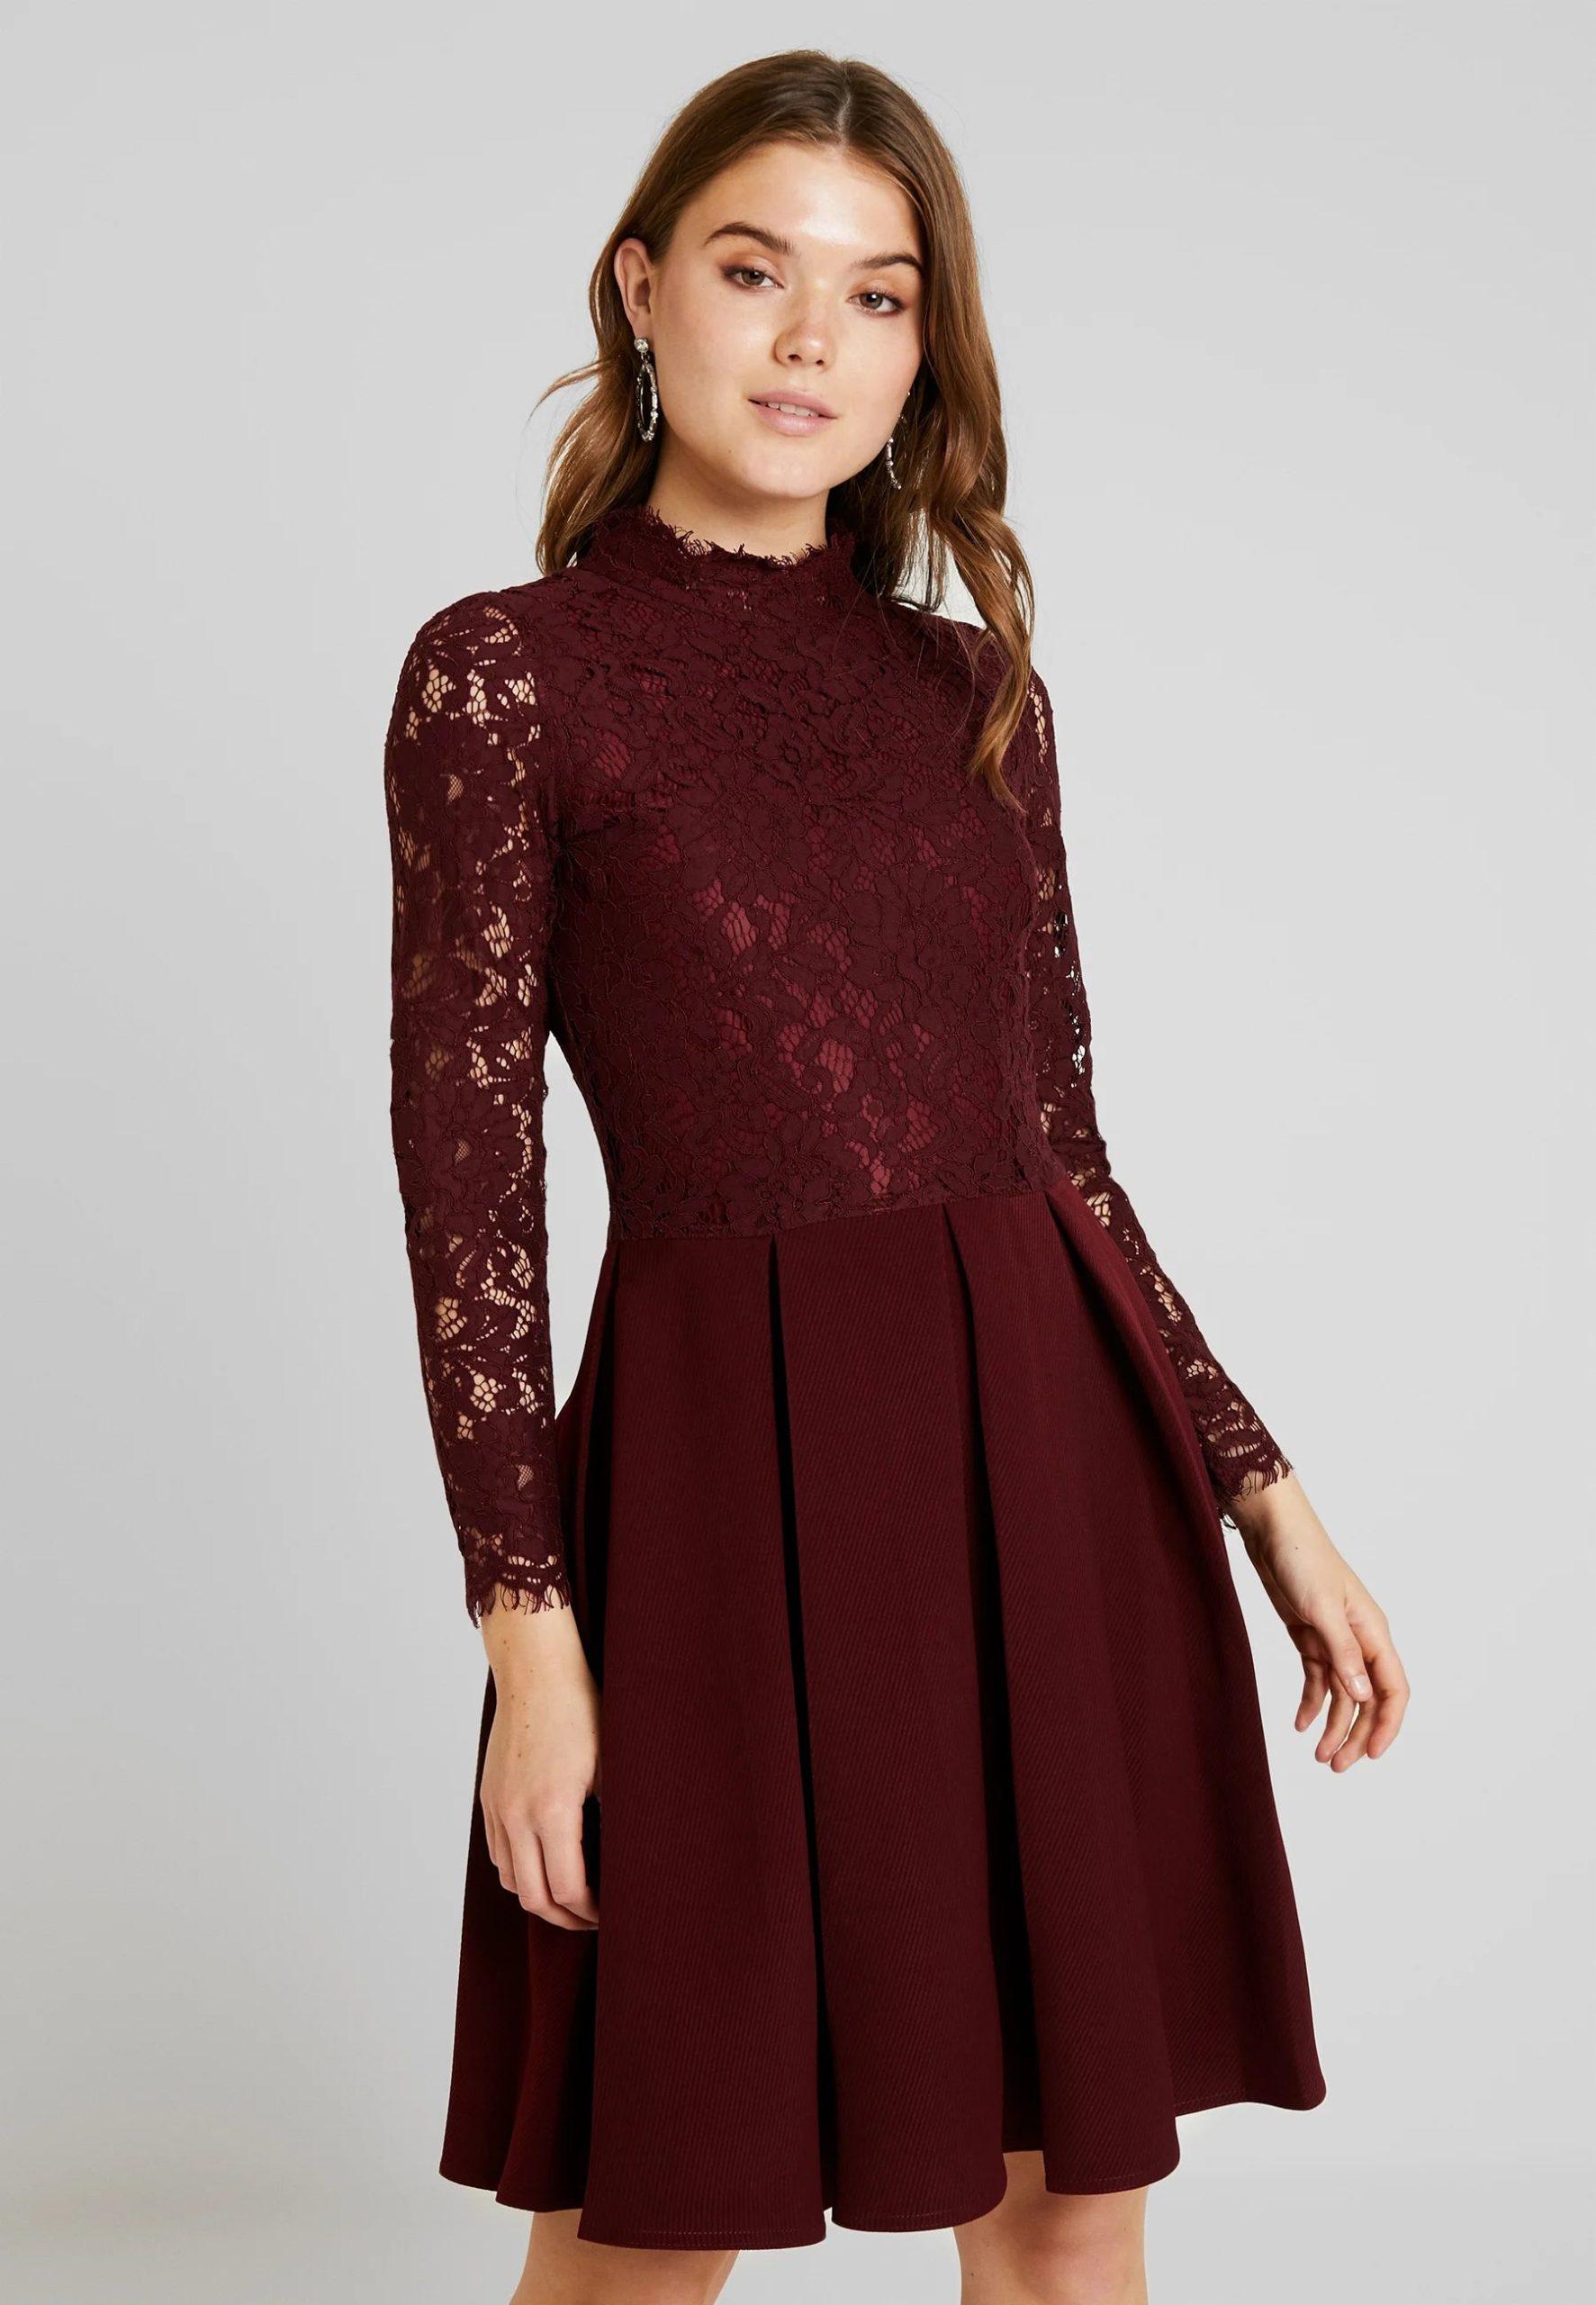 Long-sleeve Cocktail Neck Dress